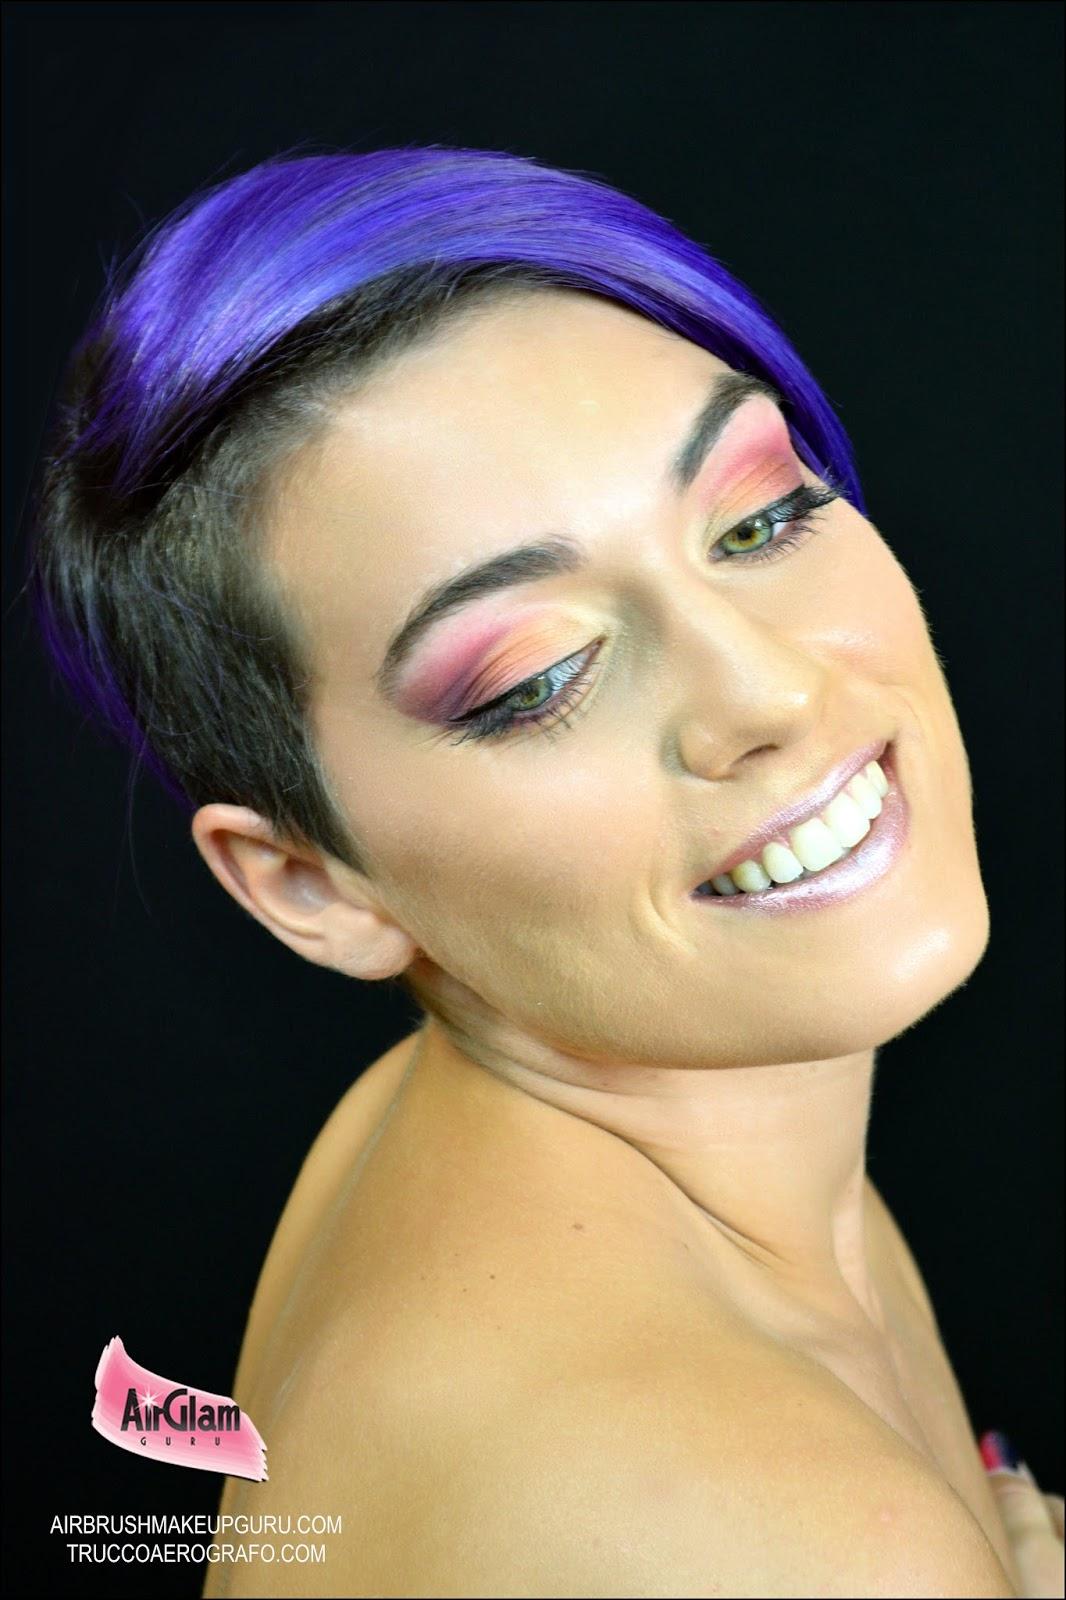 Makeup Gurus On Youtube: The Airbrush Makeup Guru